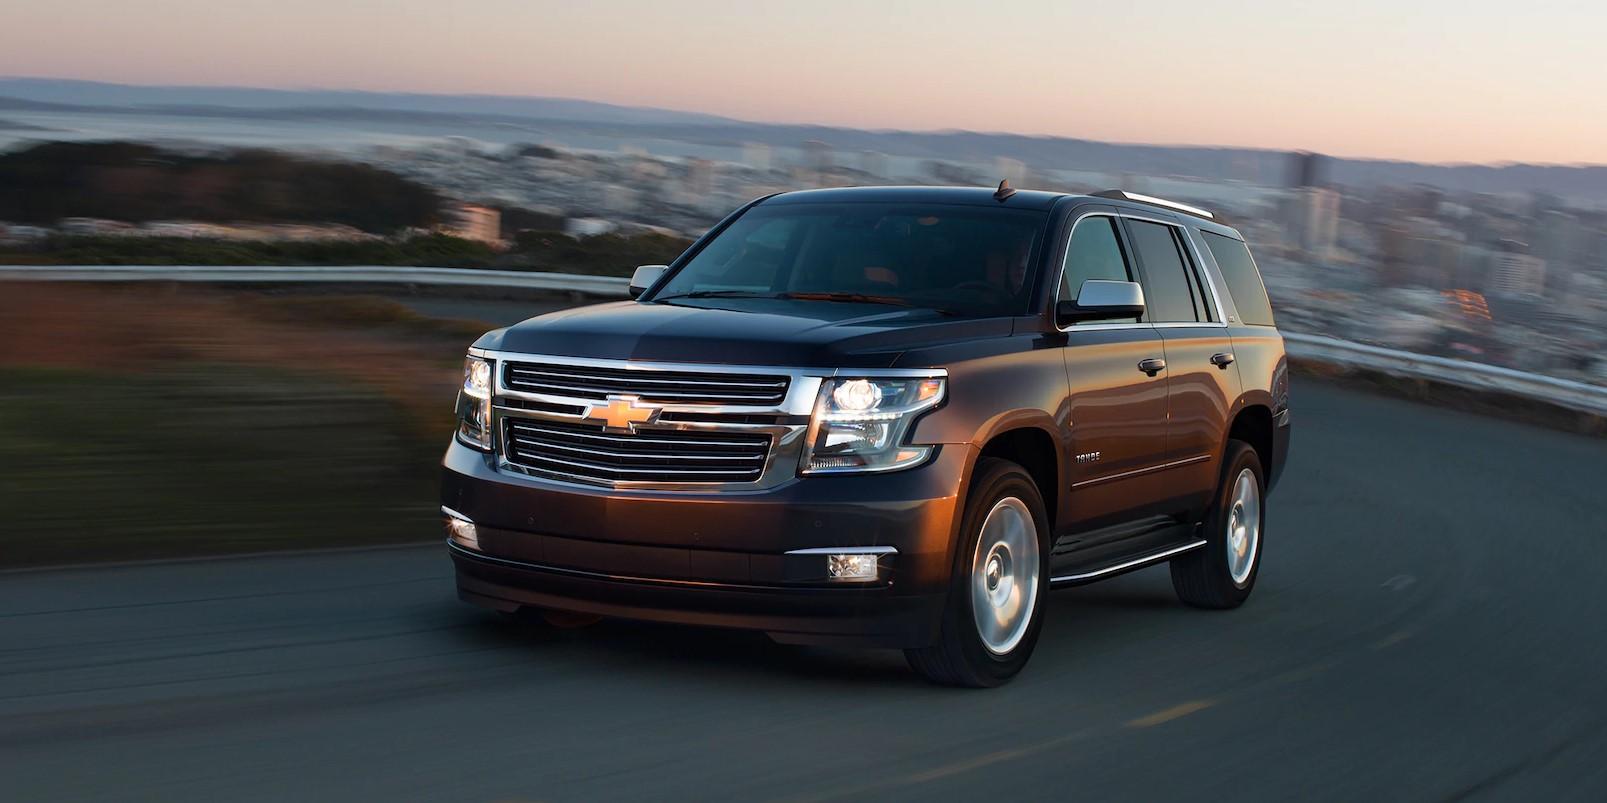 2018 Chevrolet Tahoe Brown Front Exterior